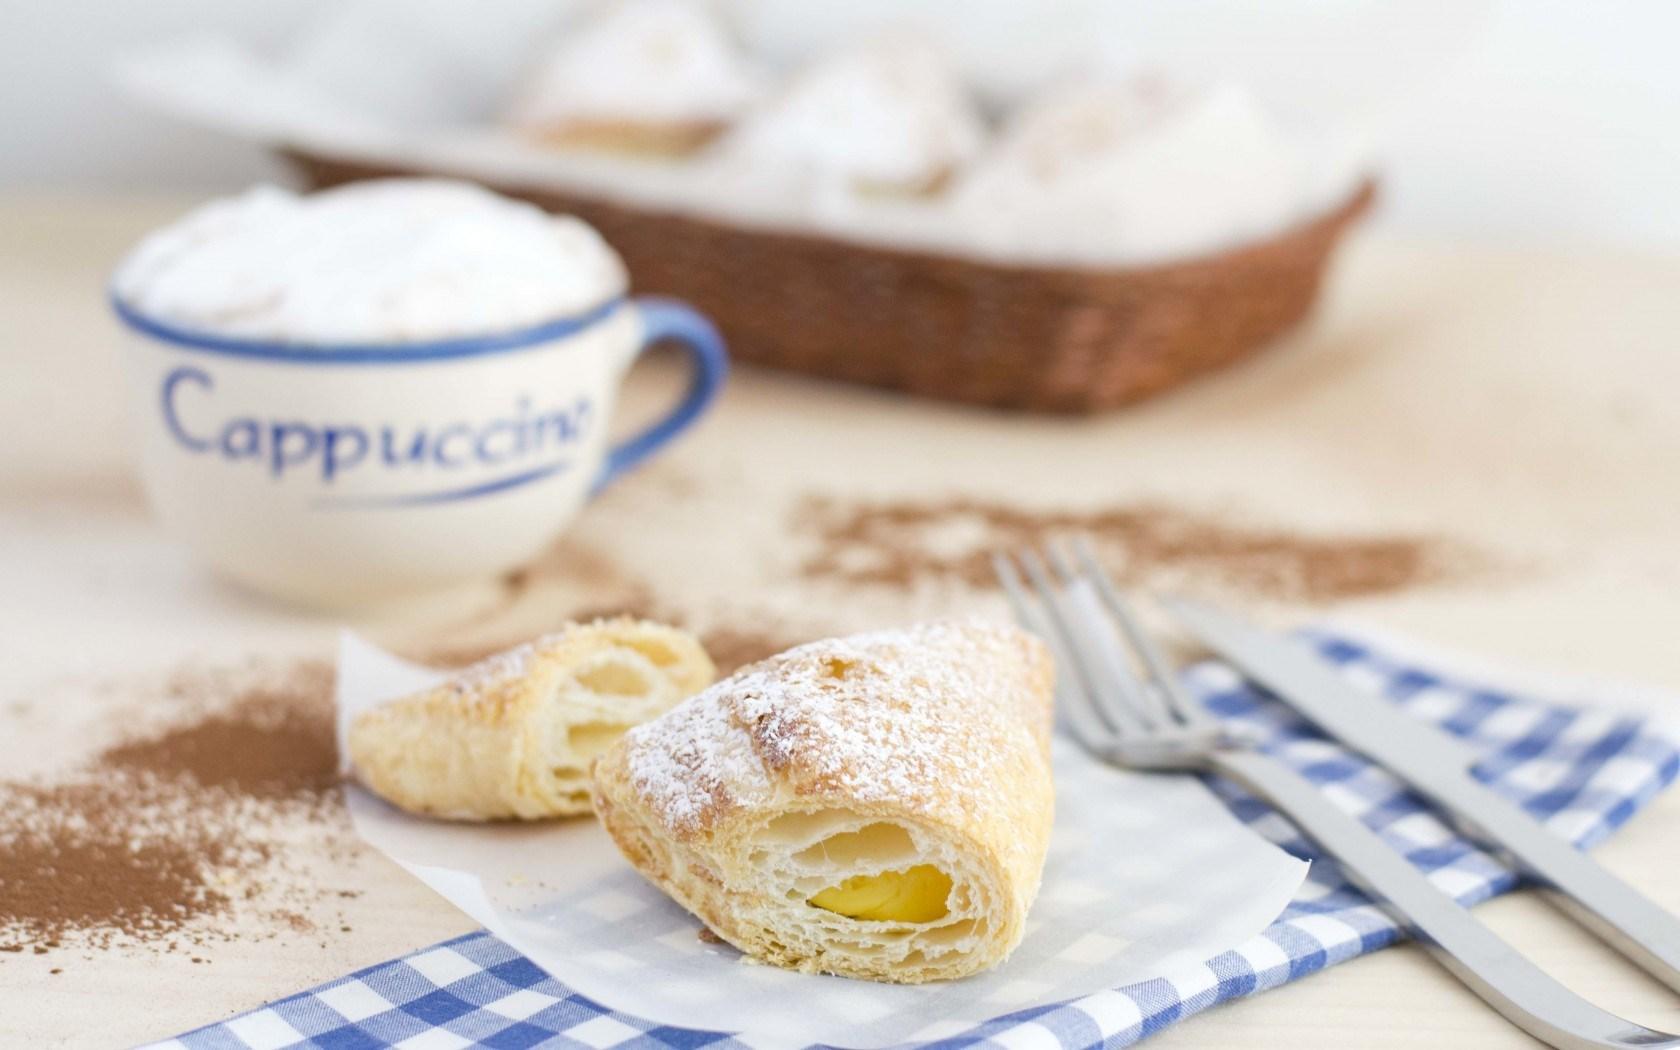 Food Breakfast Croissant Cup Dessert Cappuccino